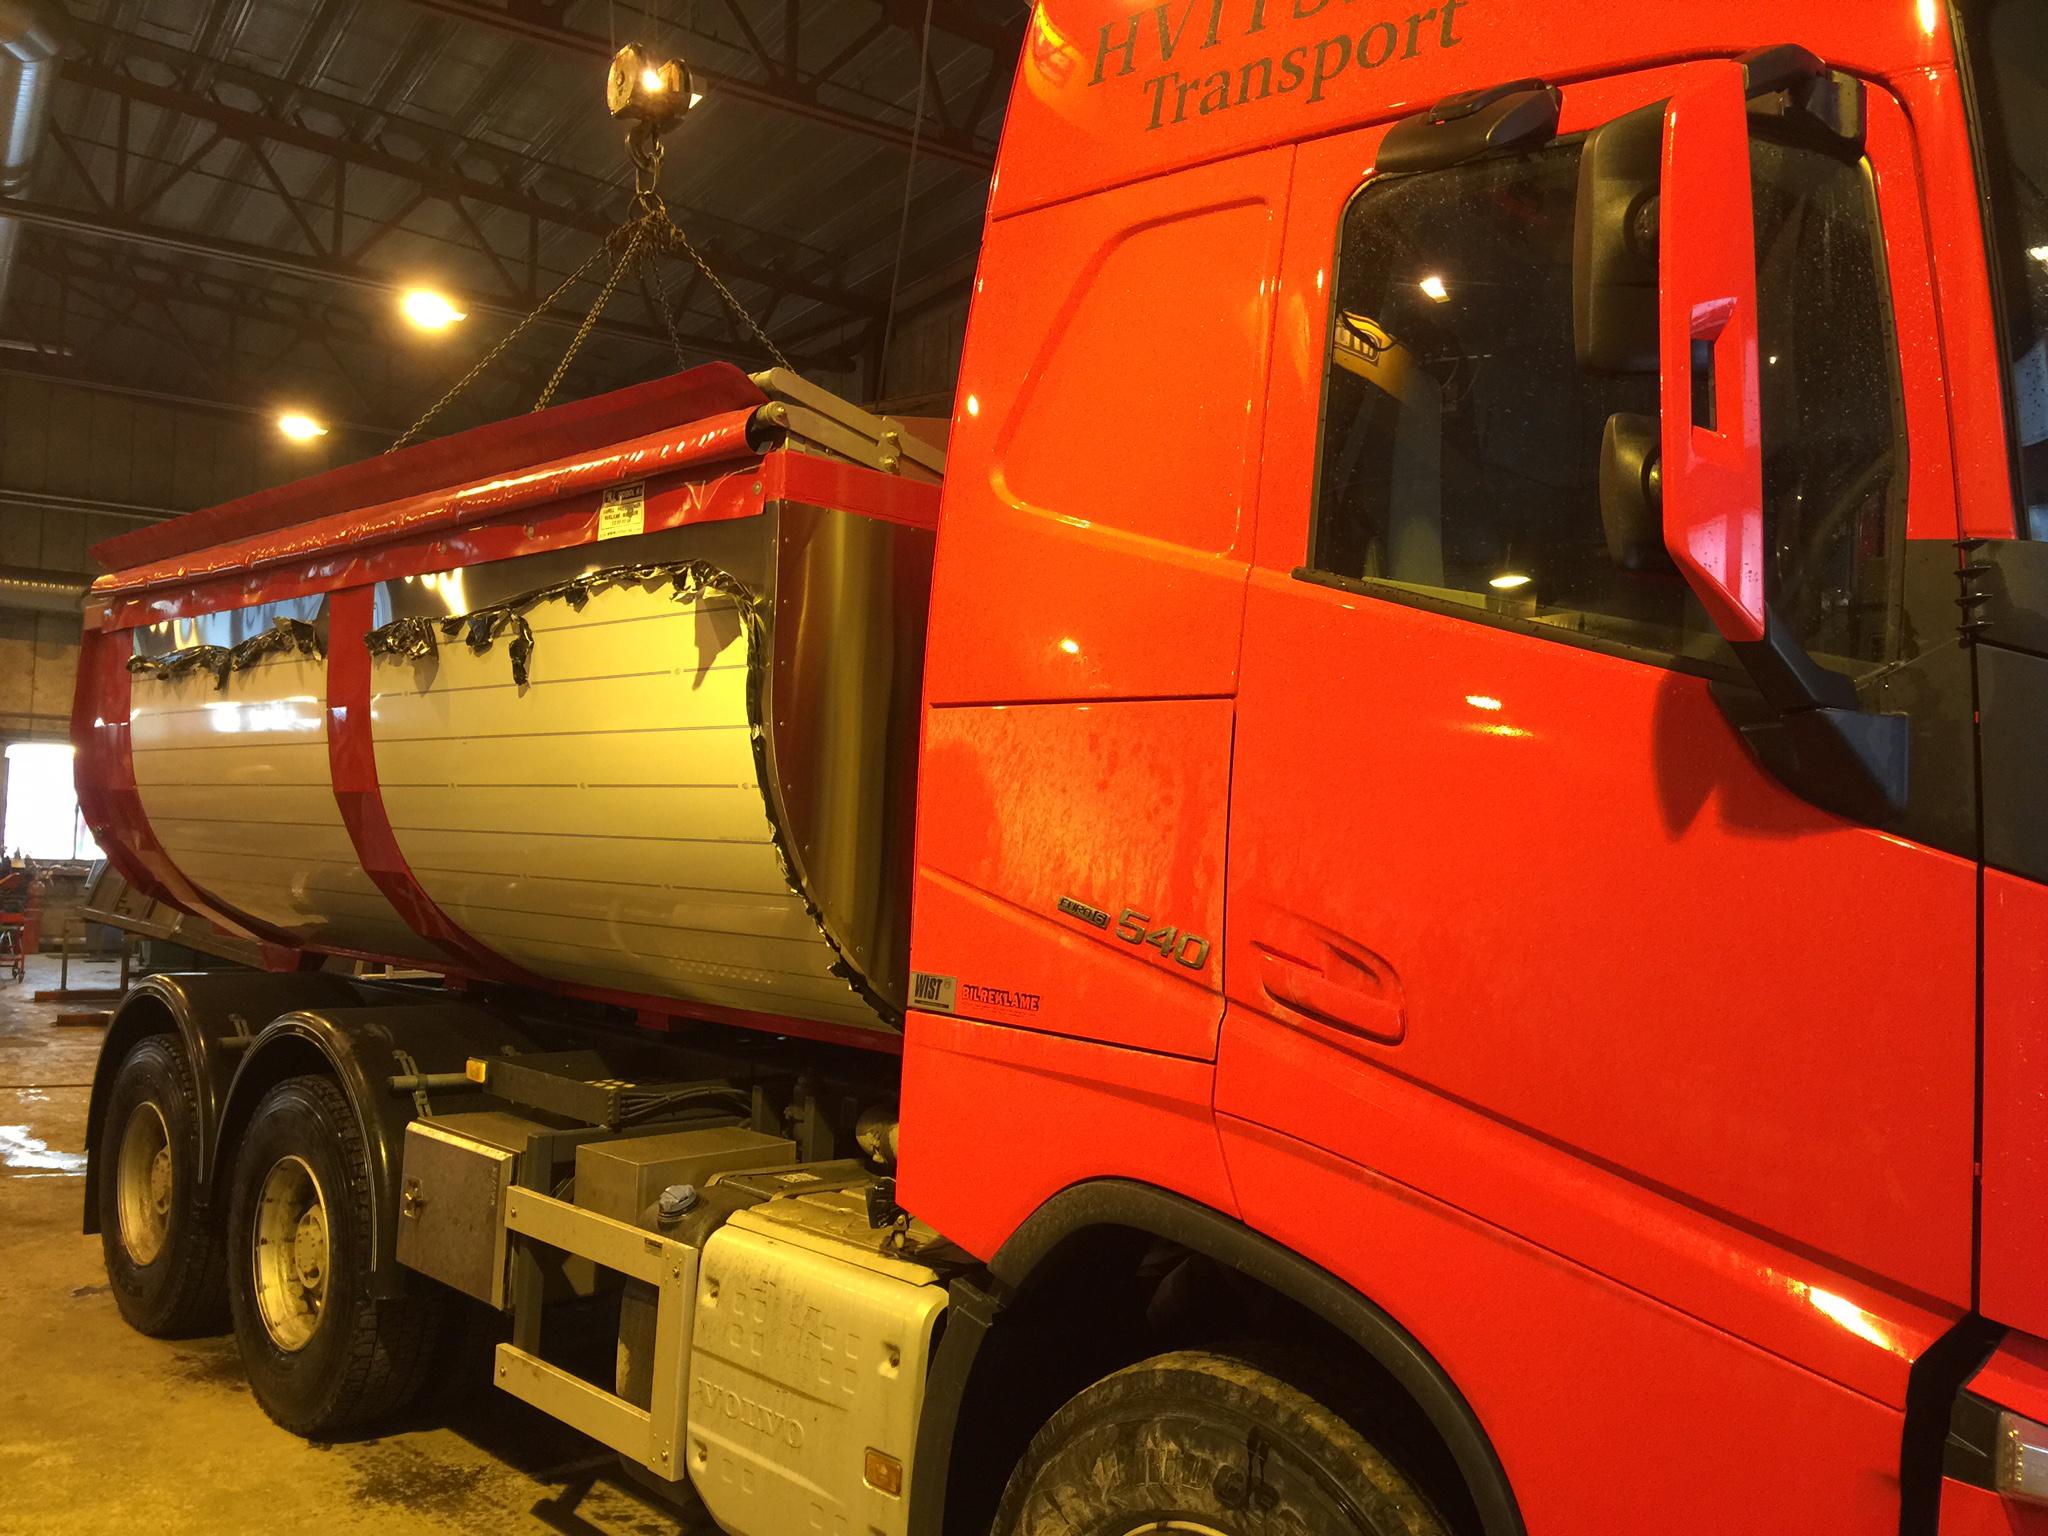 Asfalftbalje /Asfalttraug i Hardox 450 Stål levert ~ Kunde: HVITSAND Transport ~ http://hvitsandtransport.com